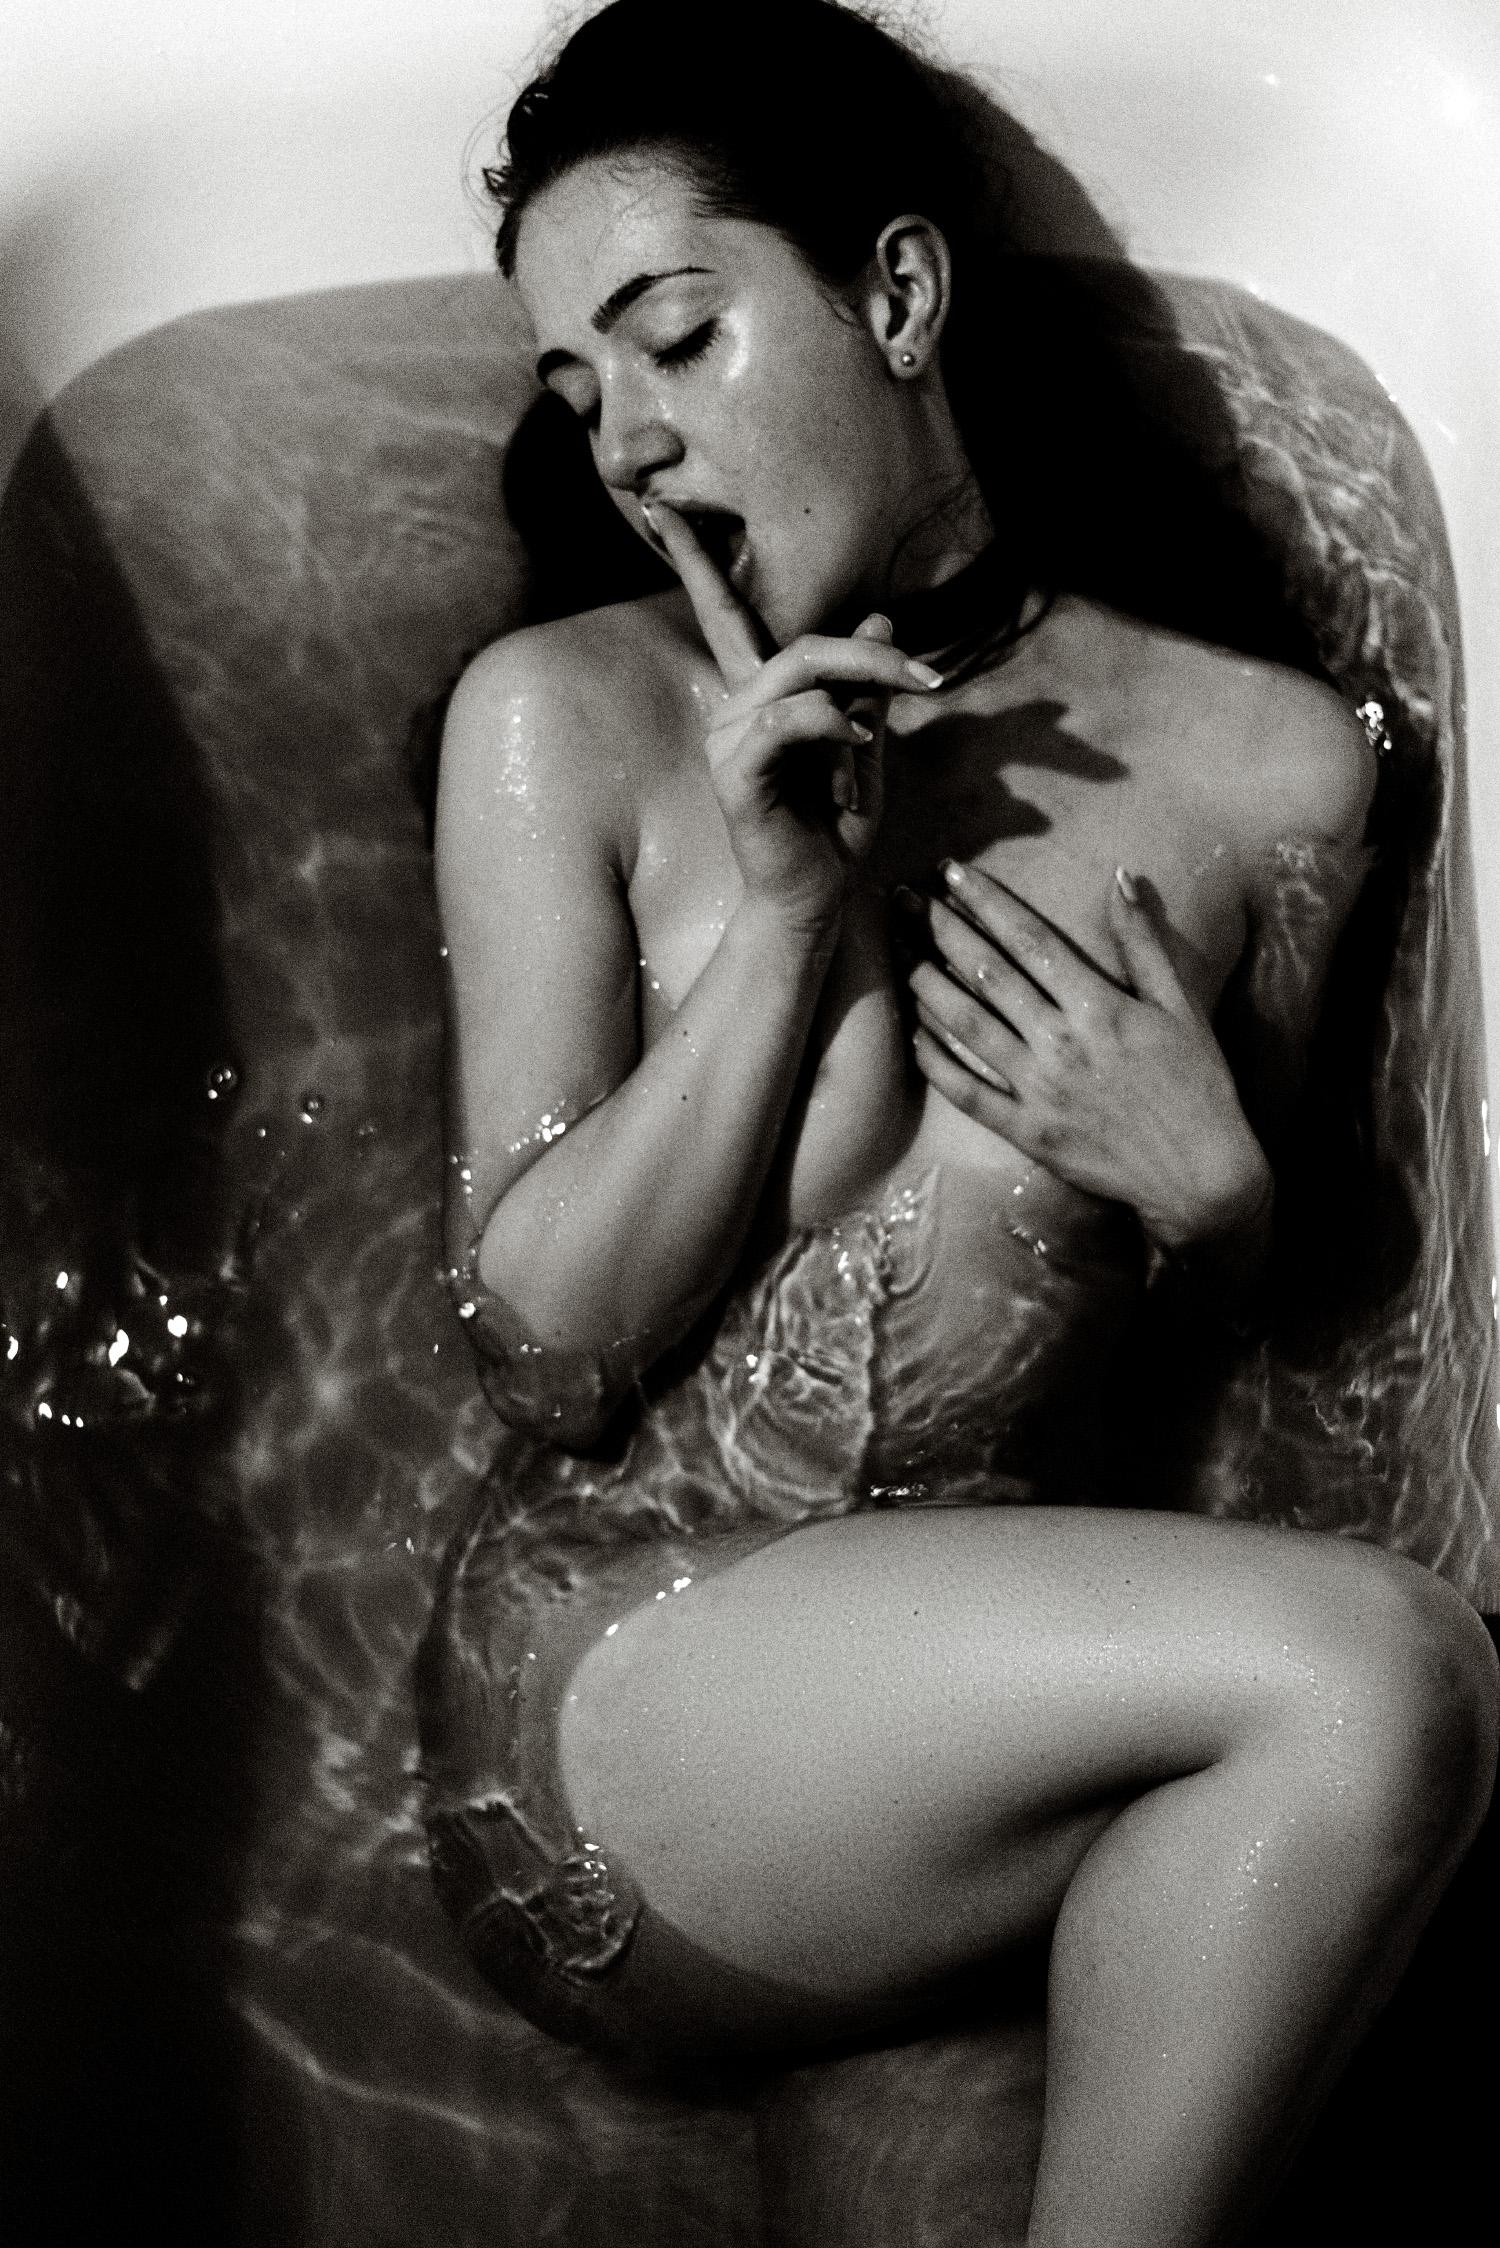 Paul_Schmidt_Photography_Elvira_Prague_05